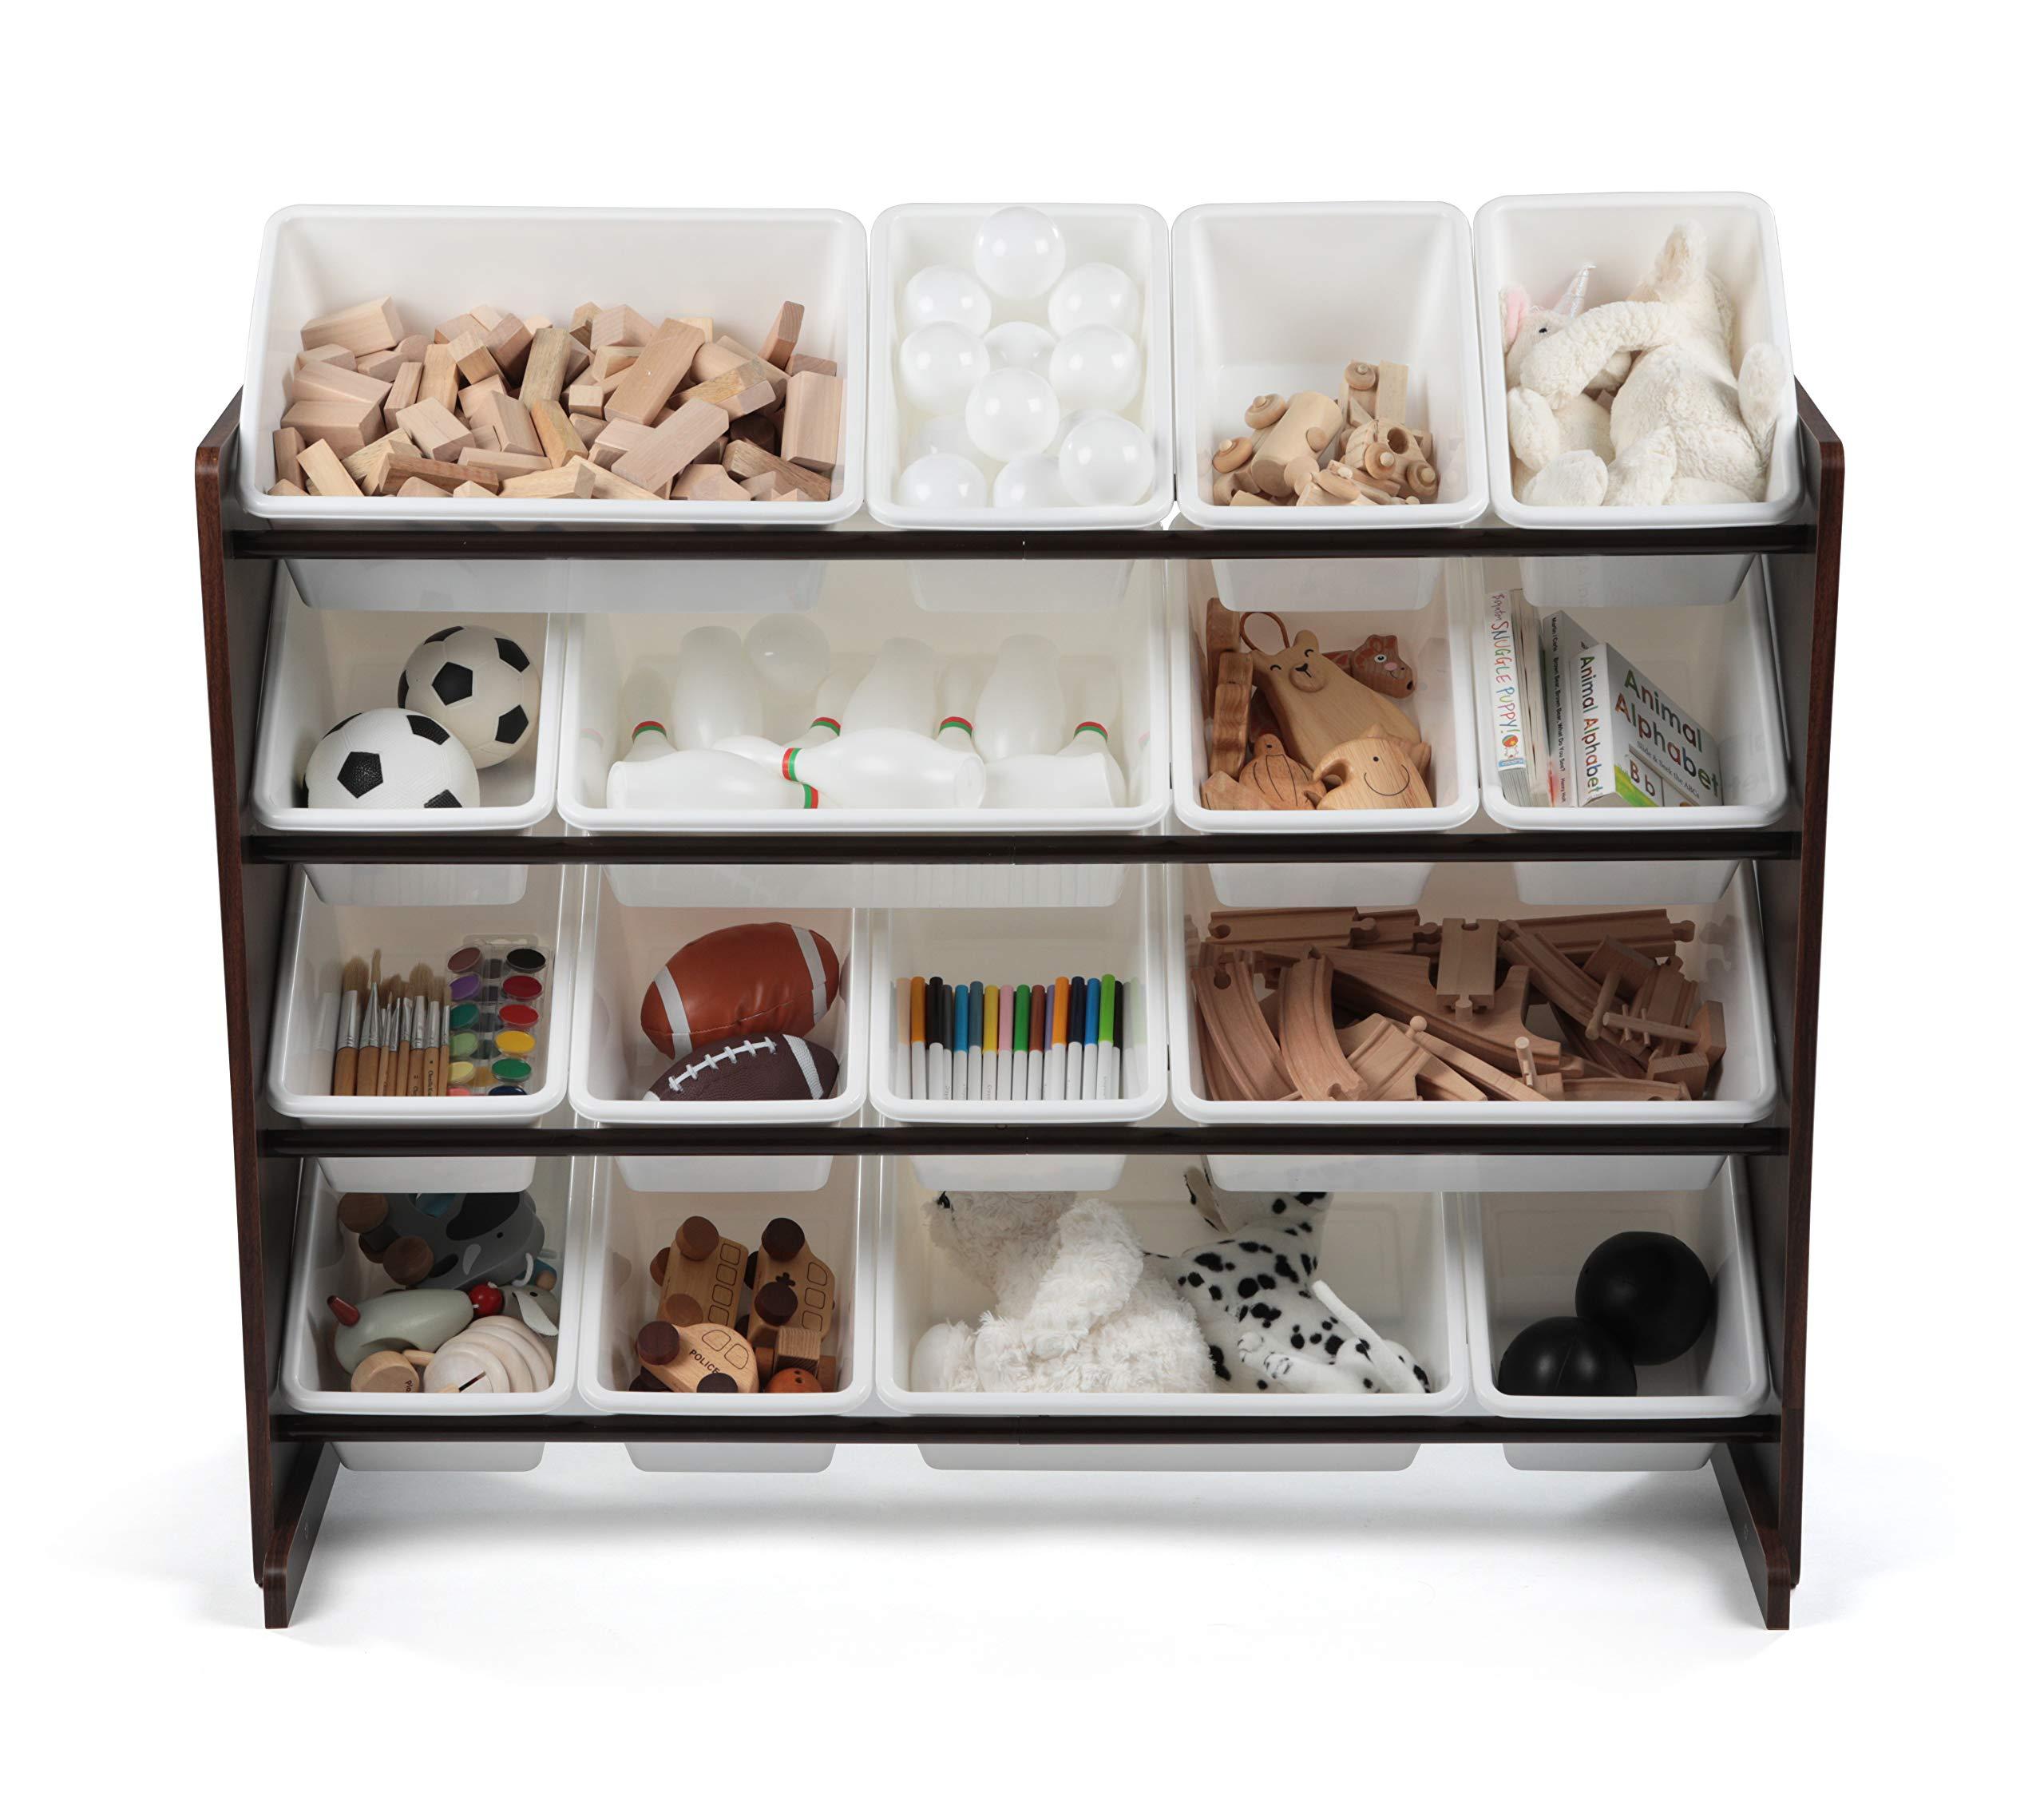 Tot Tutors WO142 Extra-Large, Supersized Toy Storage Organizer White Bins, Espresso Collection